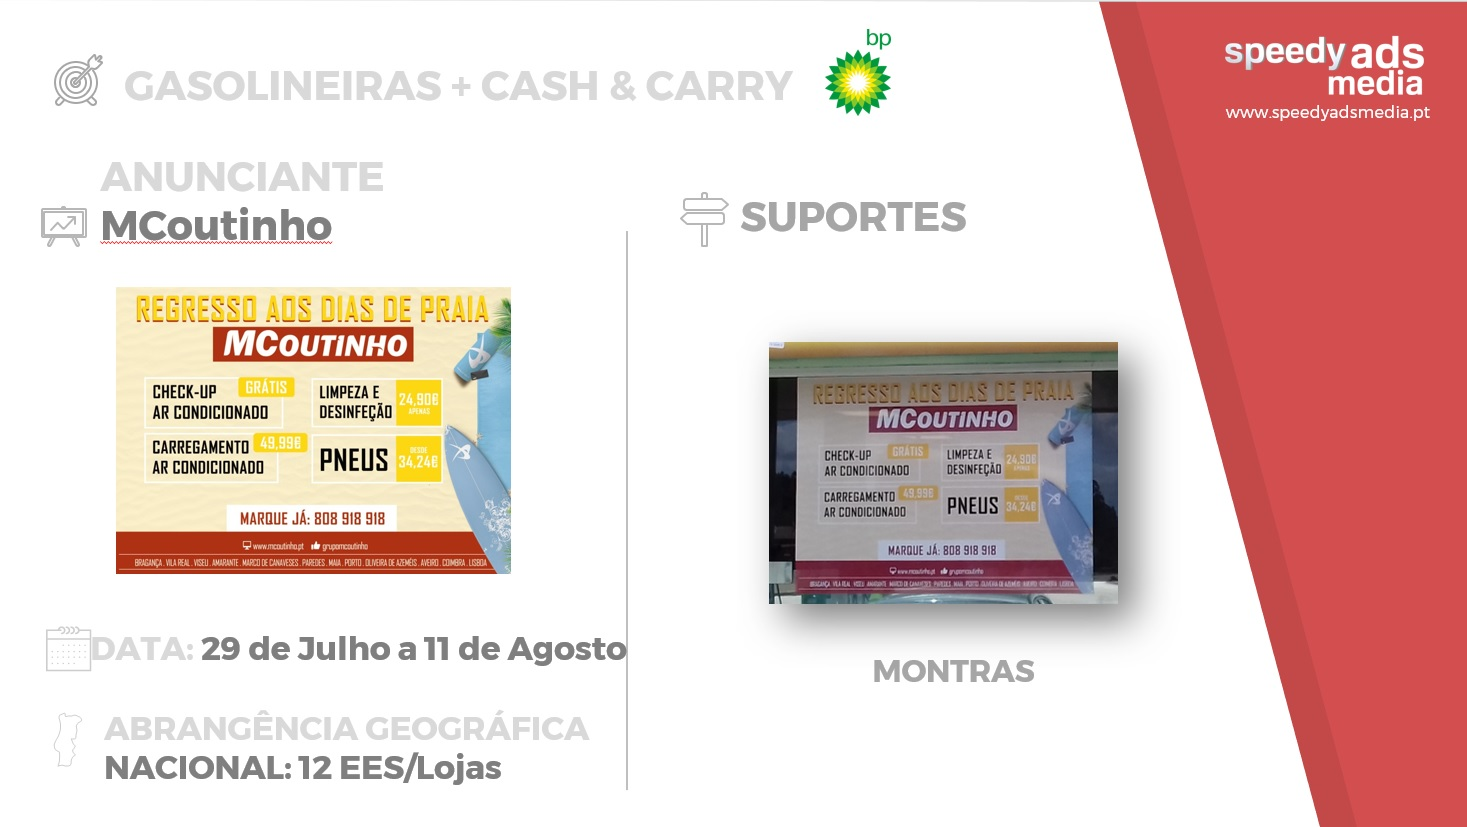 010-ficha-mcoutinho-29-Julho-a-11-Agosto